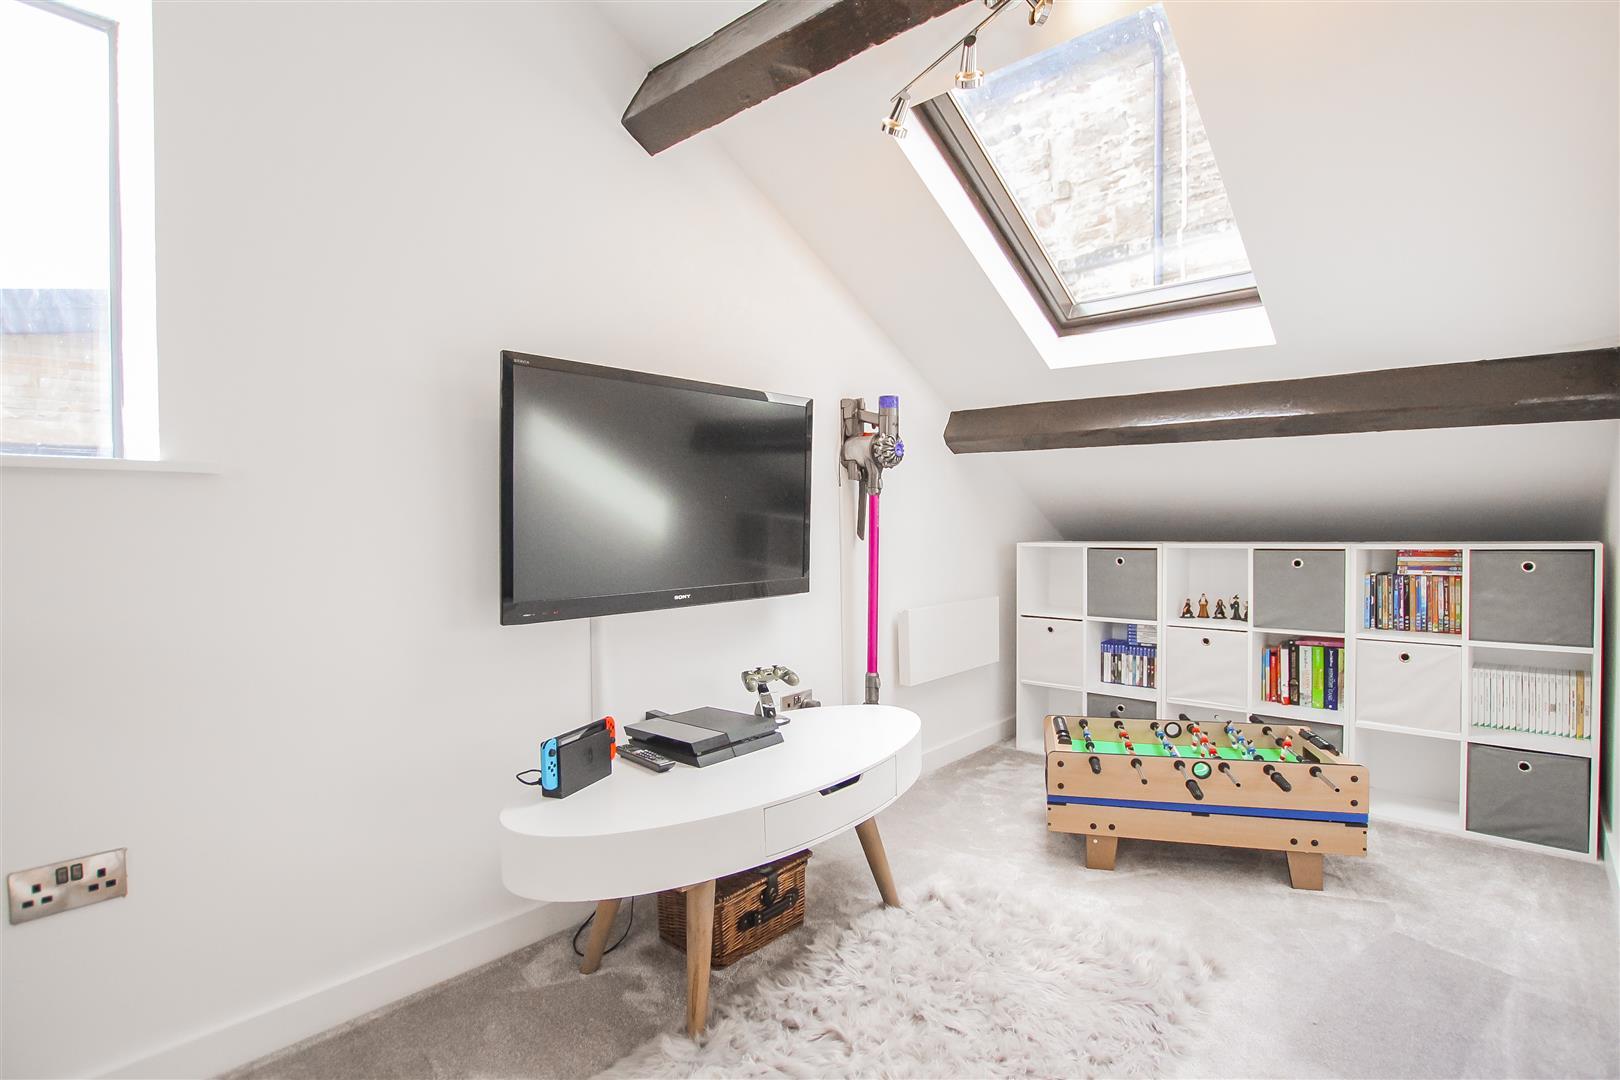 3 Bedroom Duplex Apartment For Sale - Image 31